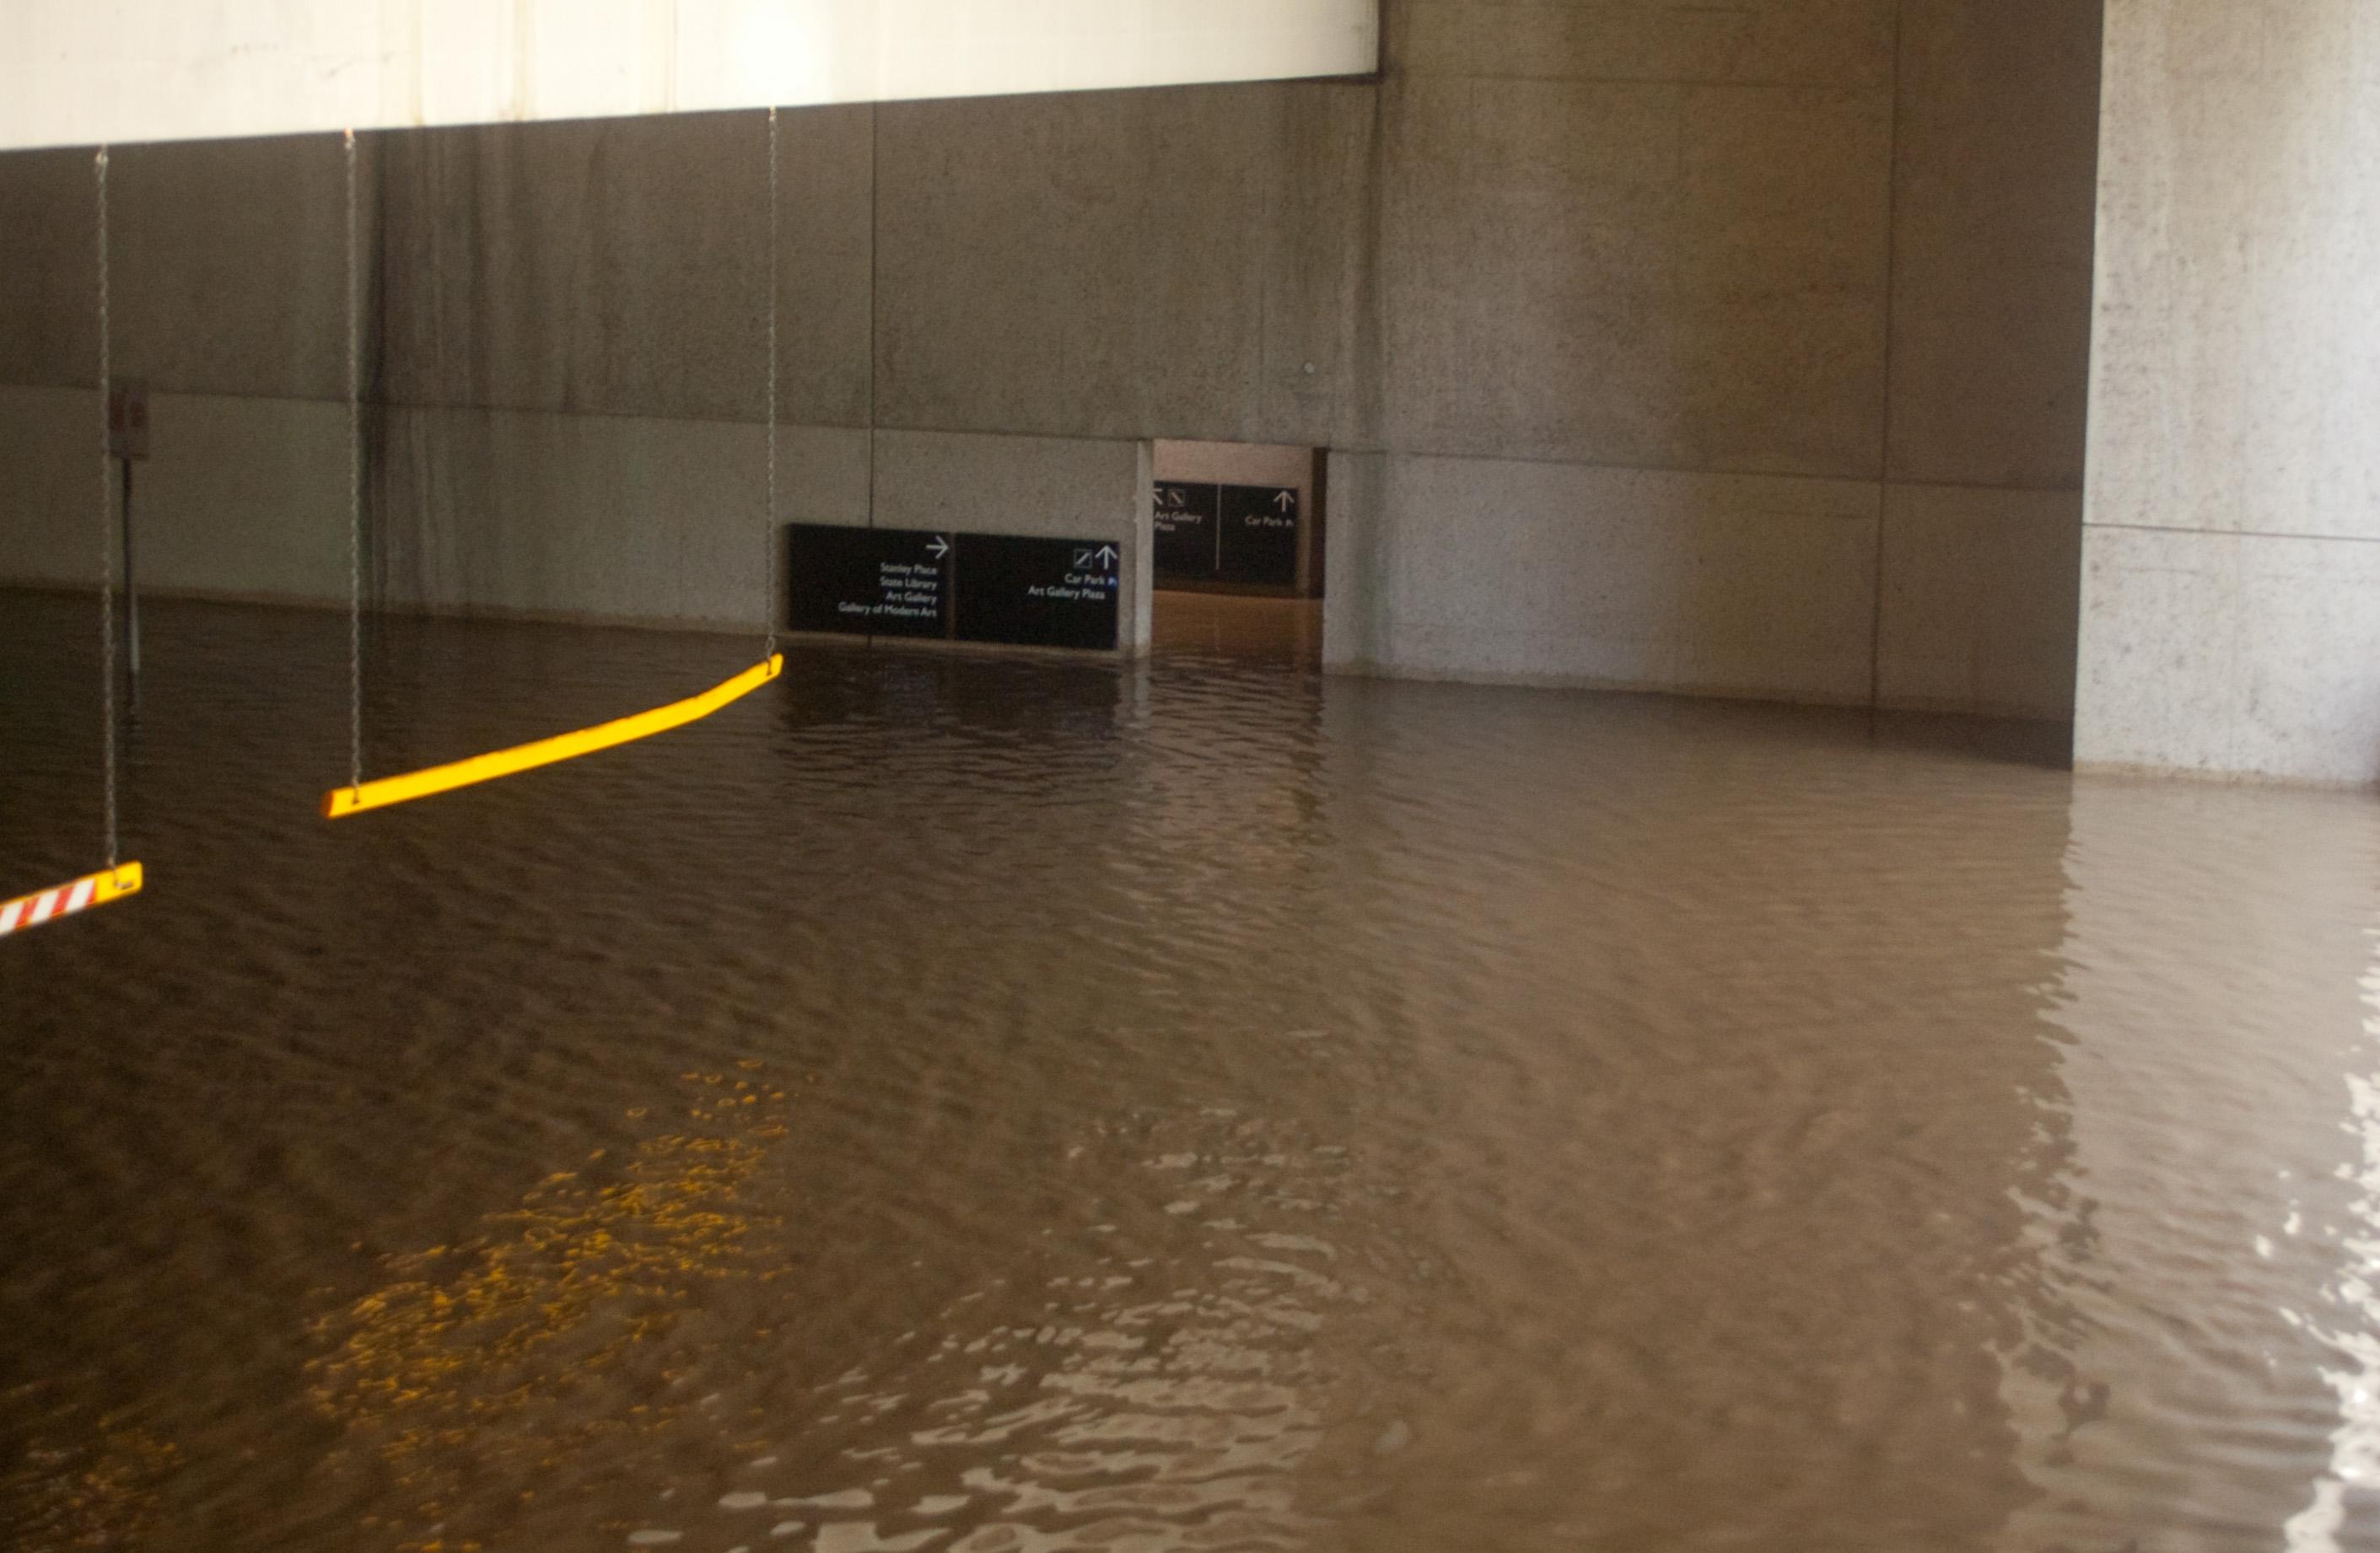 File:Queensland Museum Underground Carpark Flooded.jpg